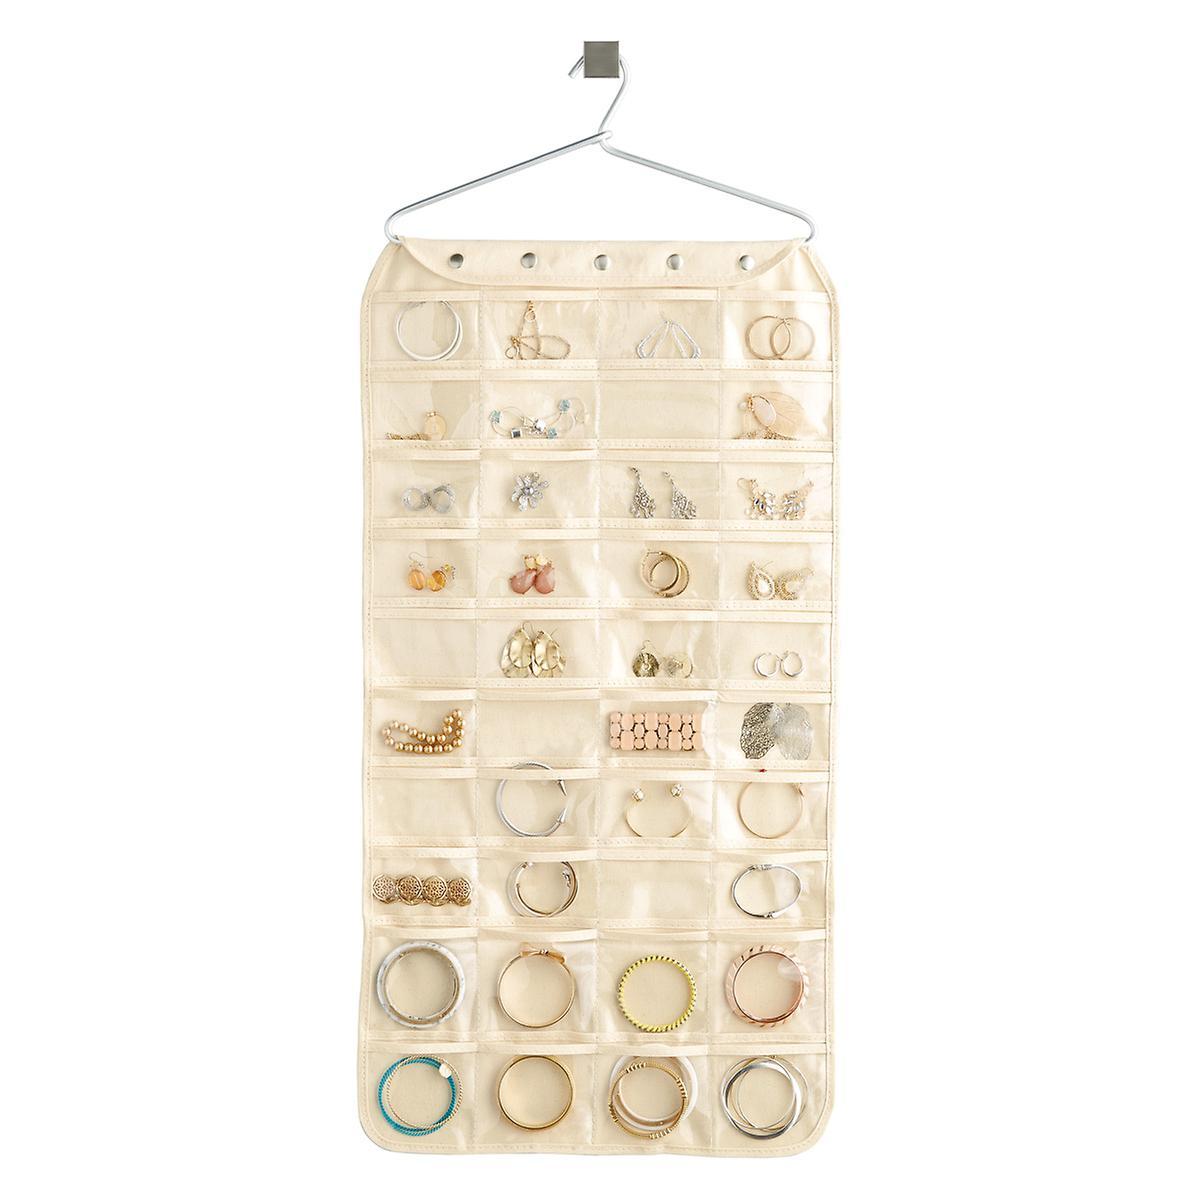 Hanging Jewelry Holder 80 Pocket Canvas Hanging Jewelry Organizer